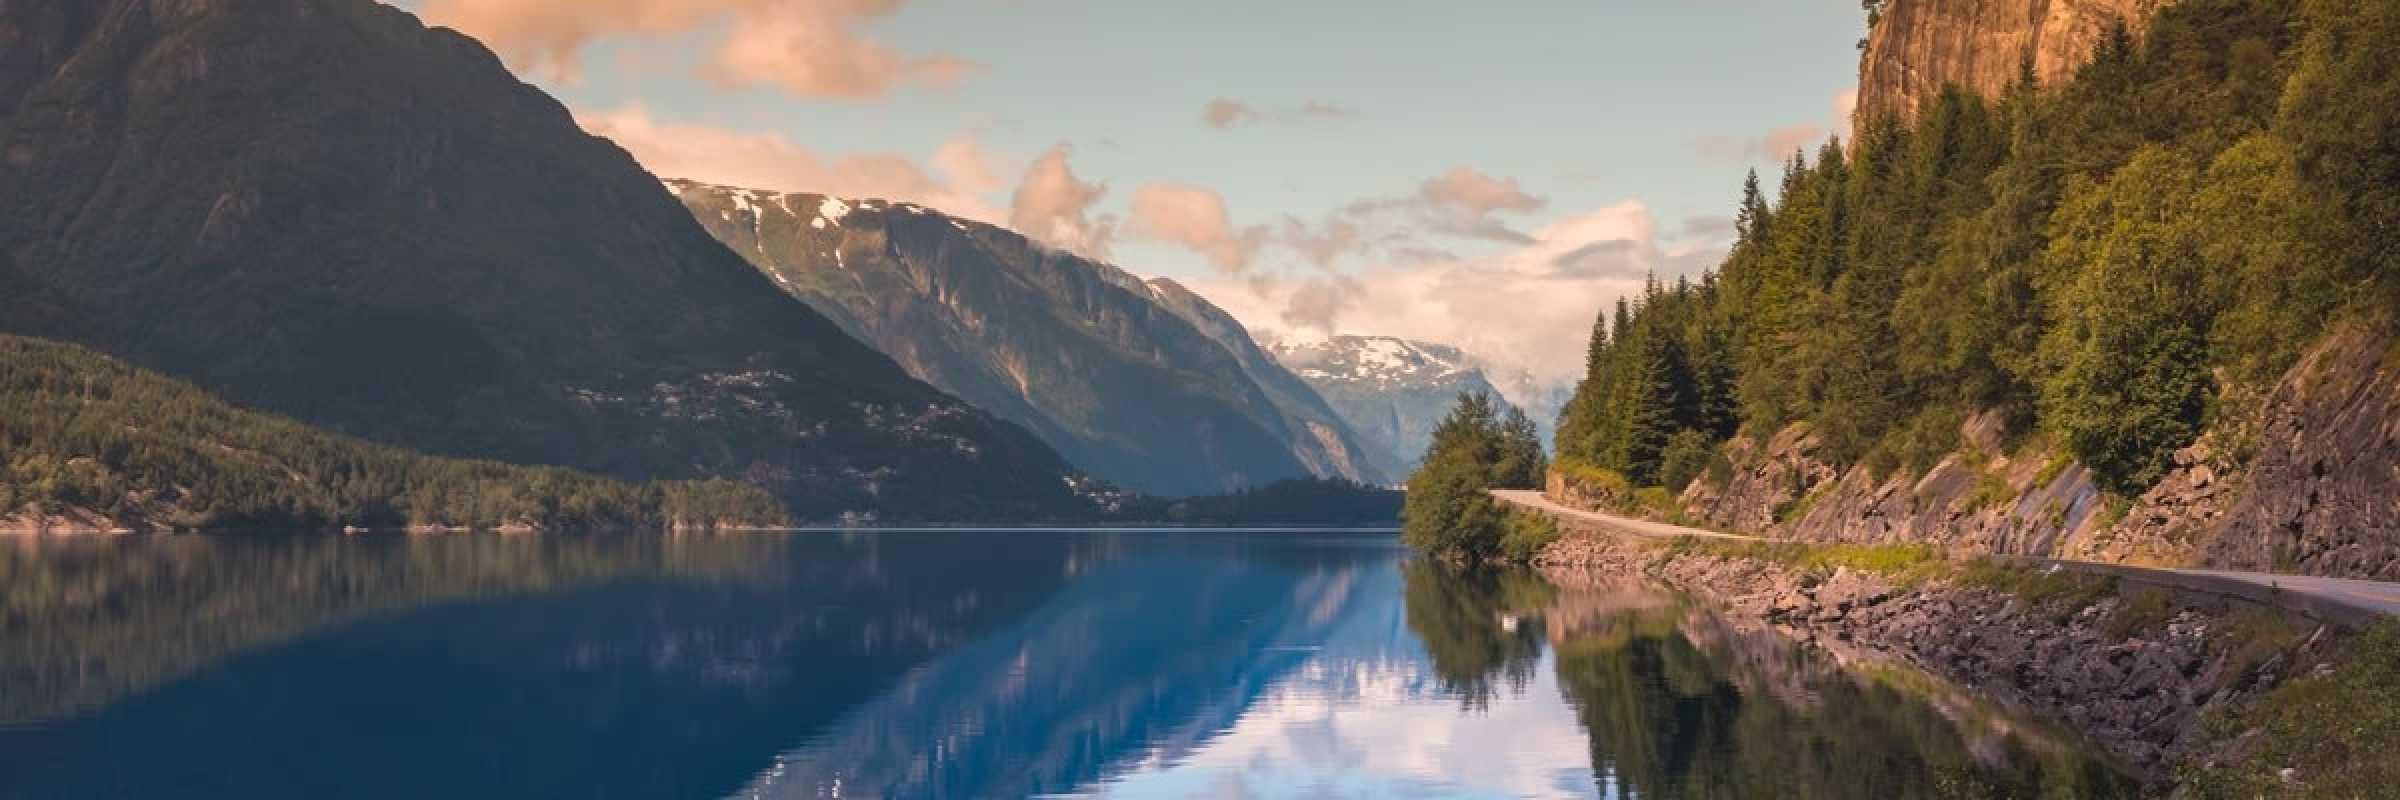 Norway adopts zero-emission regulations in world heritage fjords